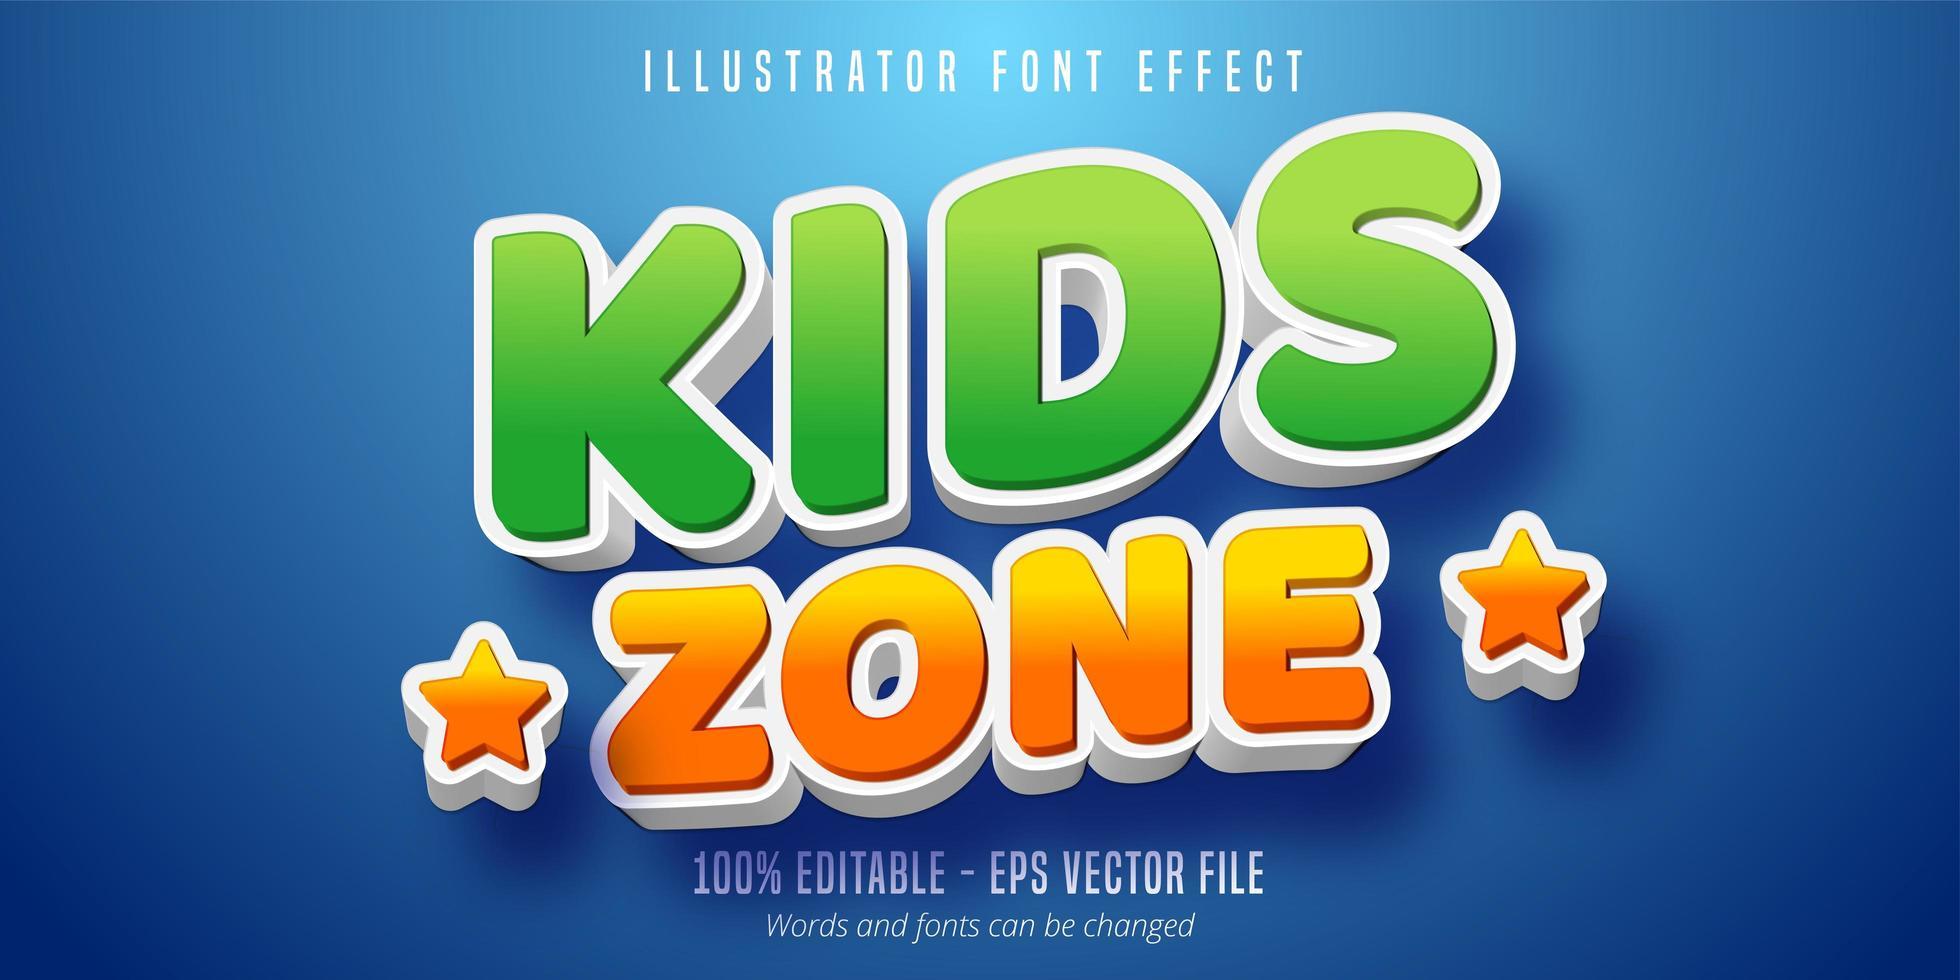 Kinderzone Text vektor